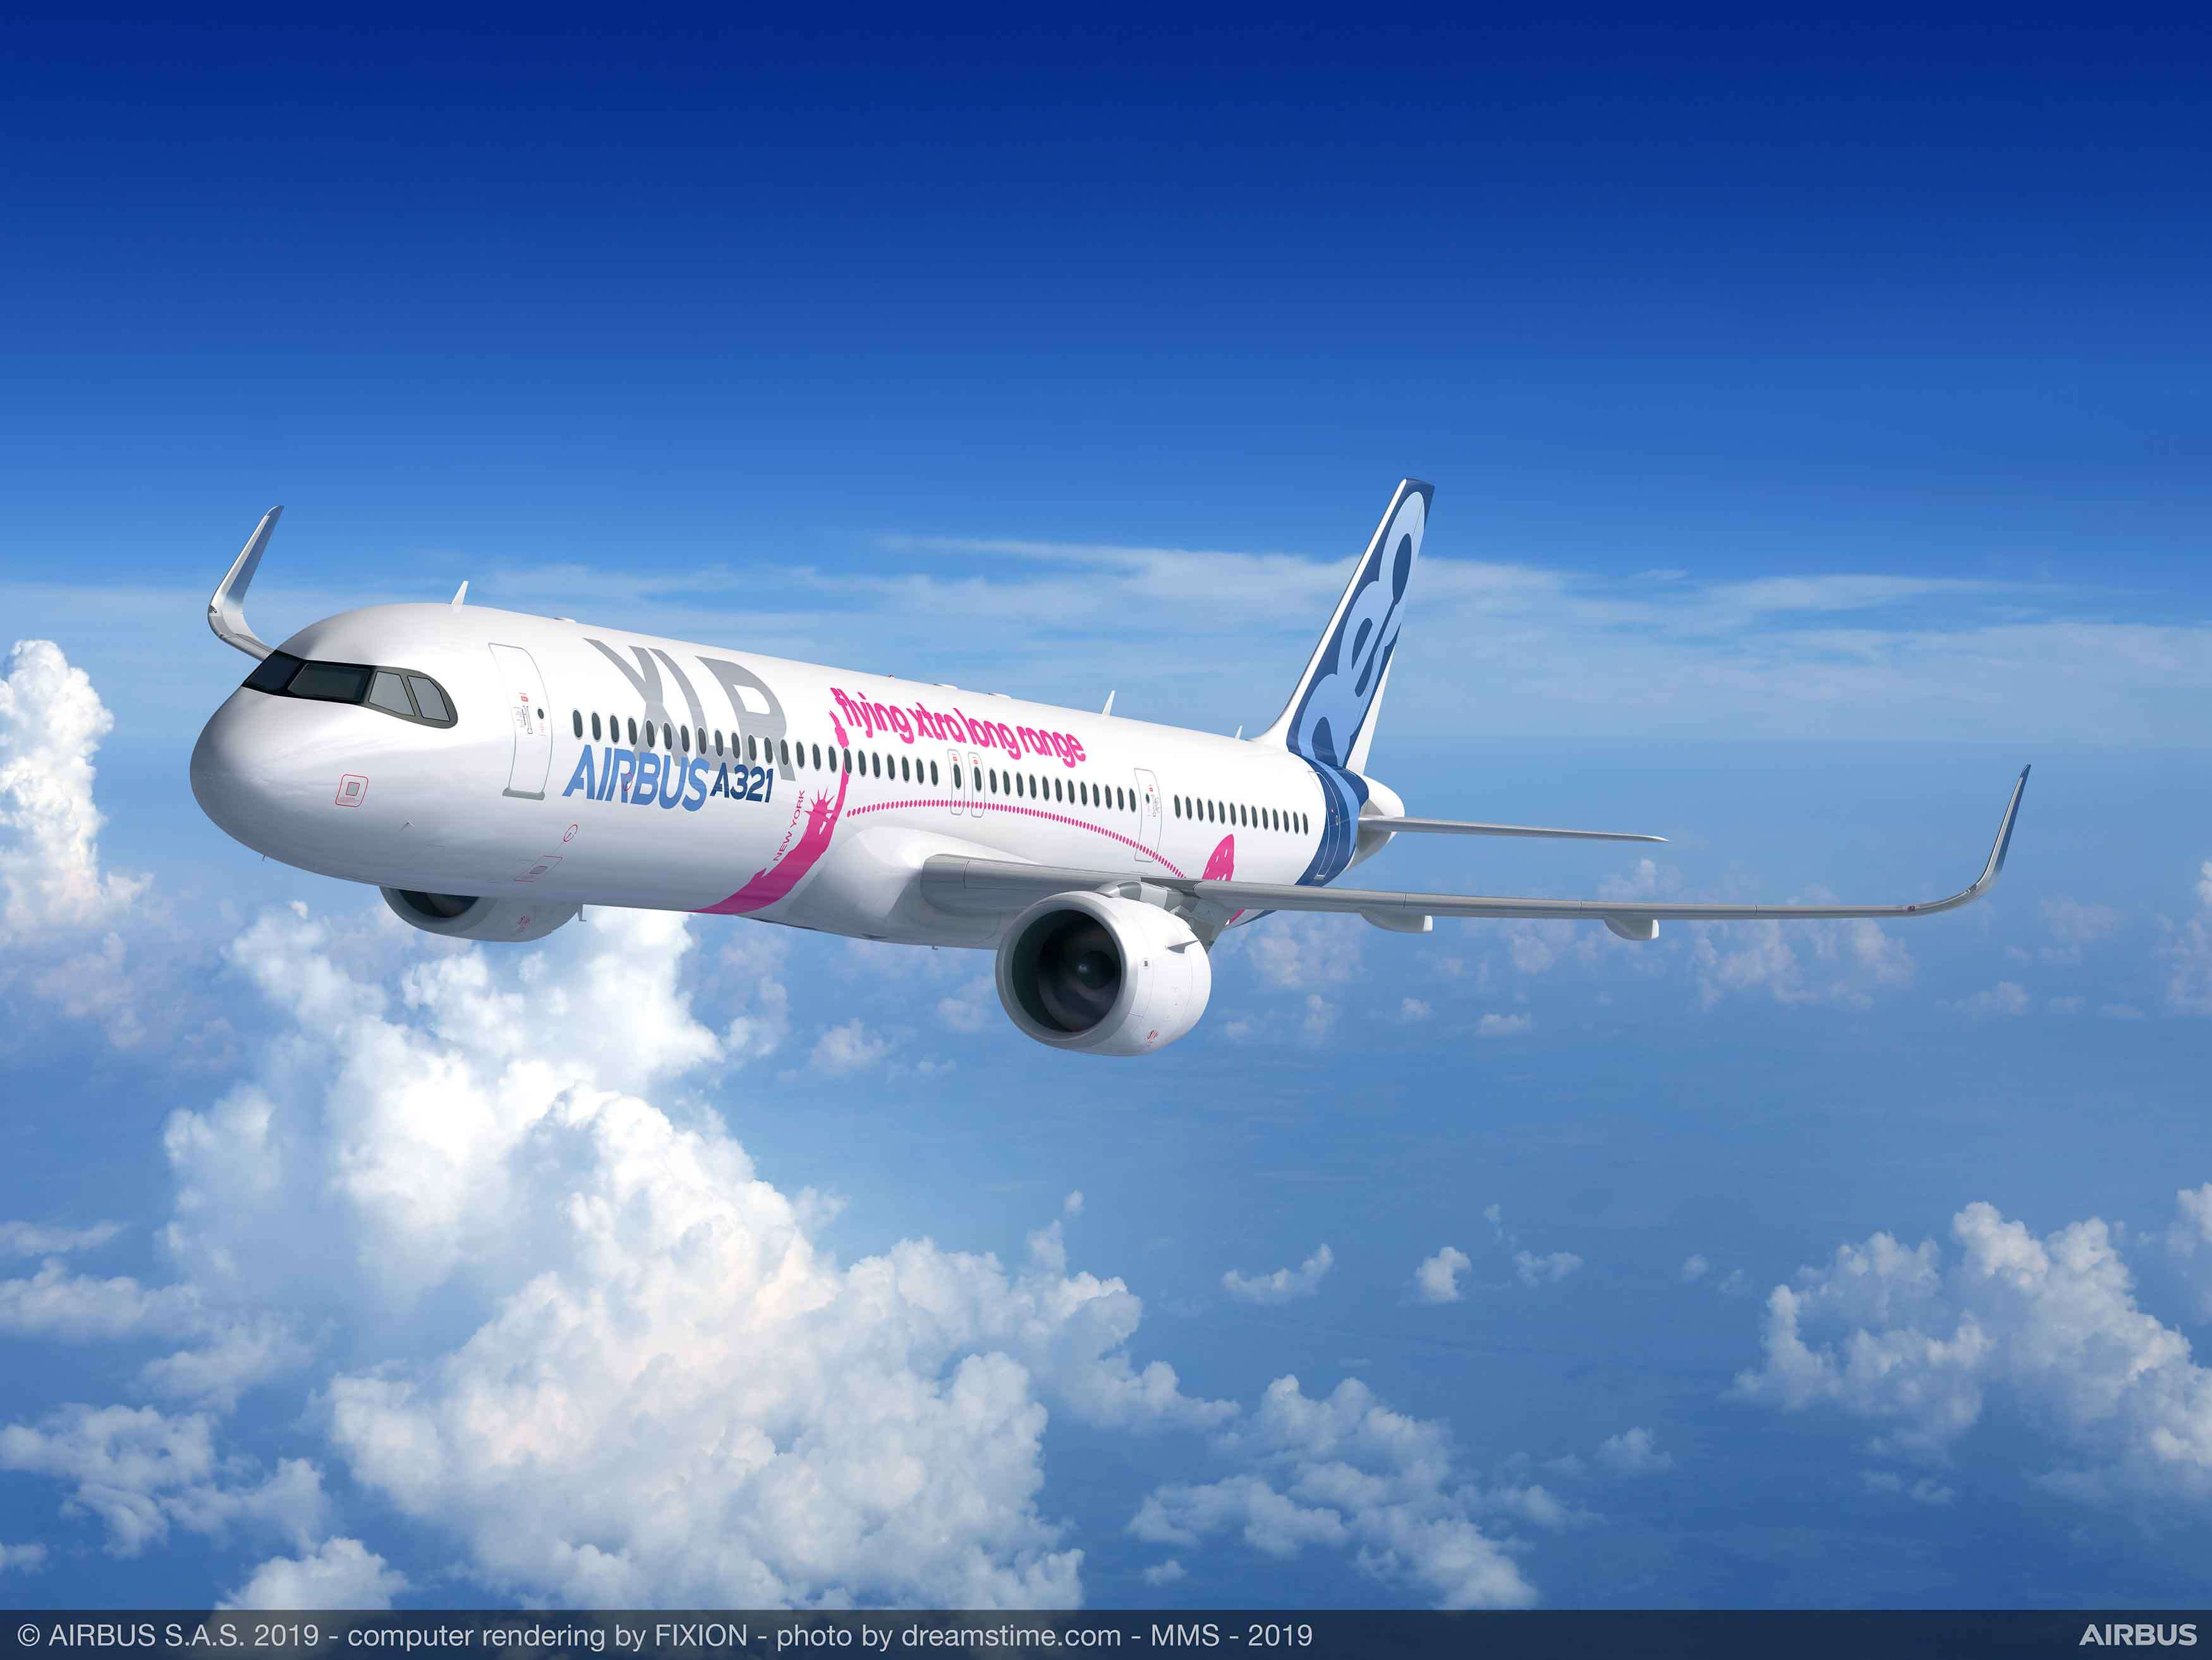 , Airbus launches longest range single-aisle airliner: the A321XLR, Buzz travel | eTurboNews |Travel News